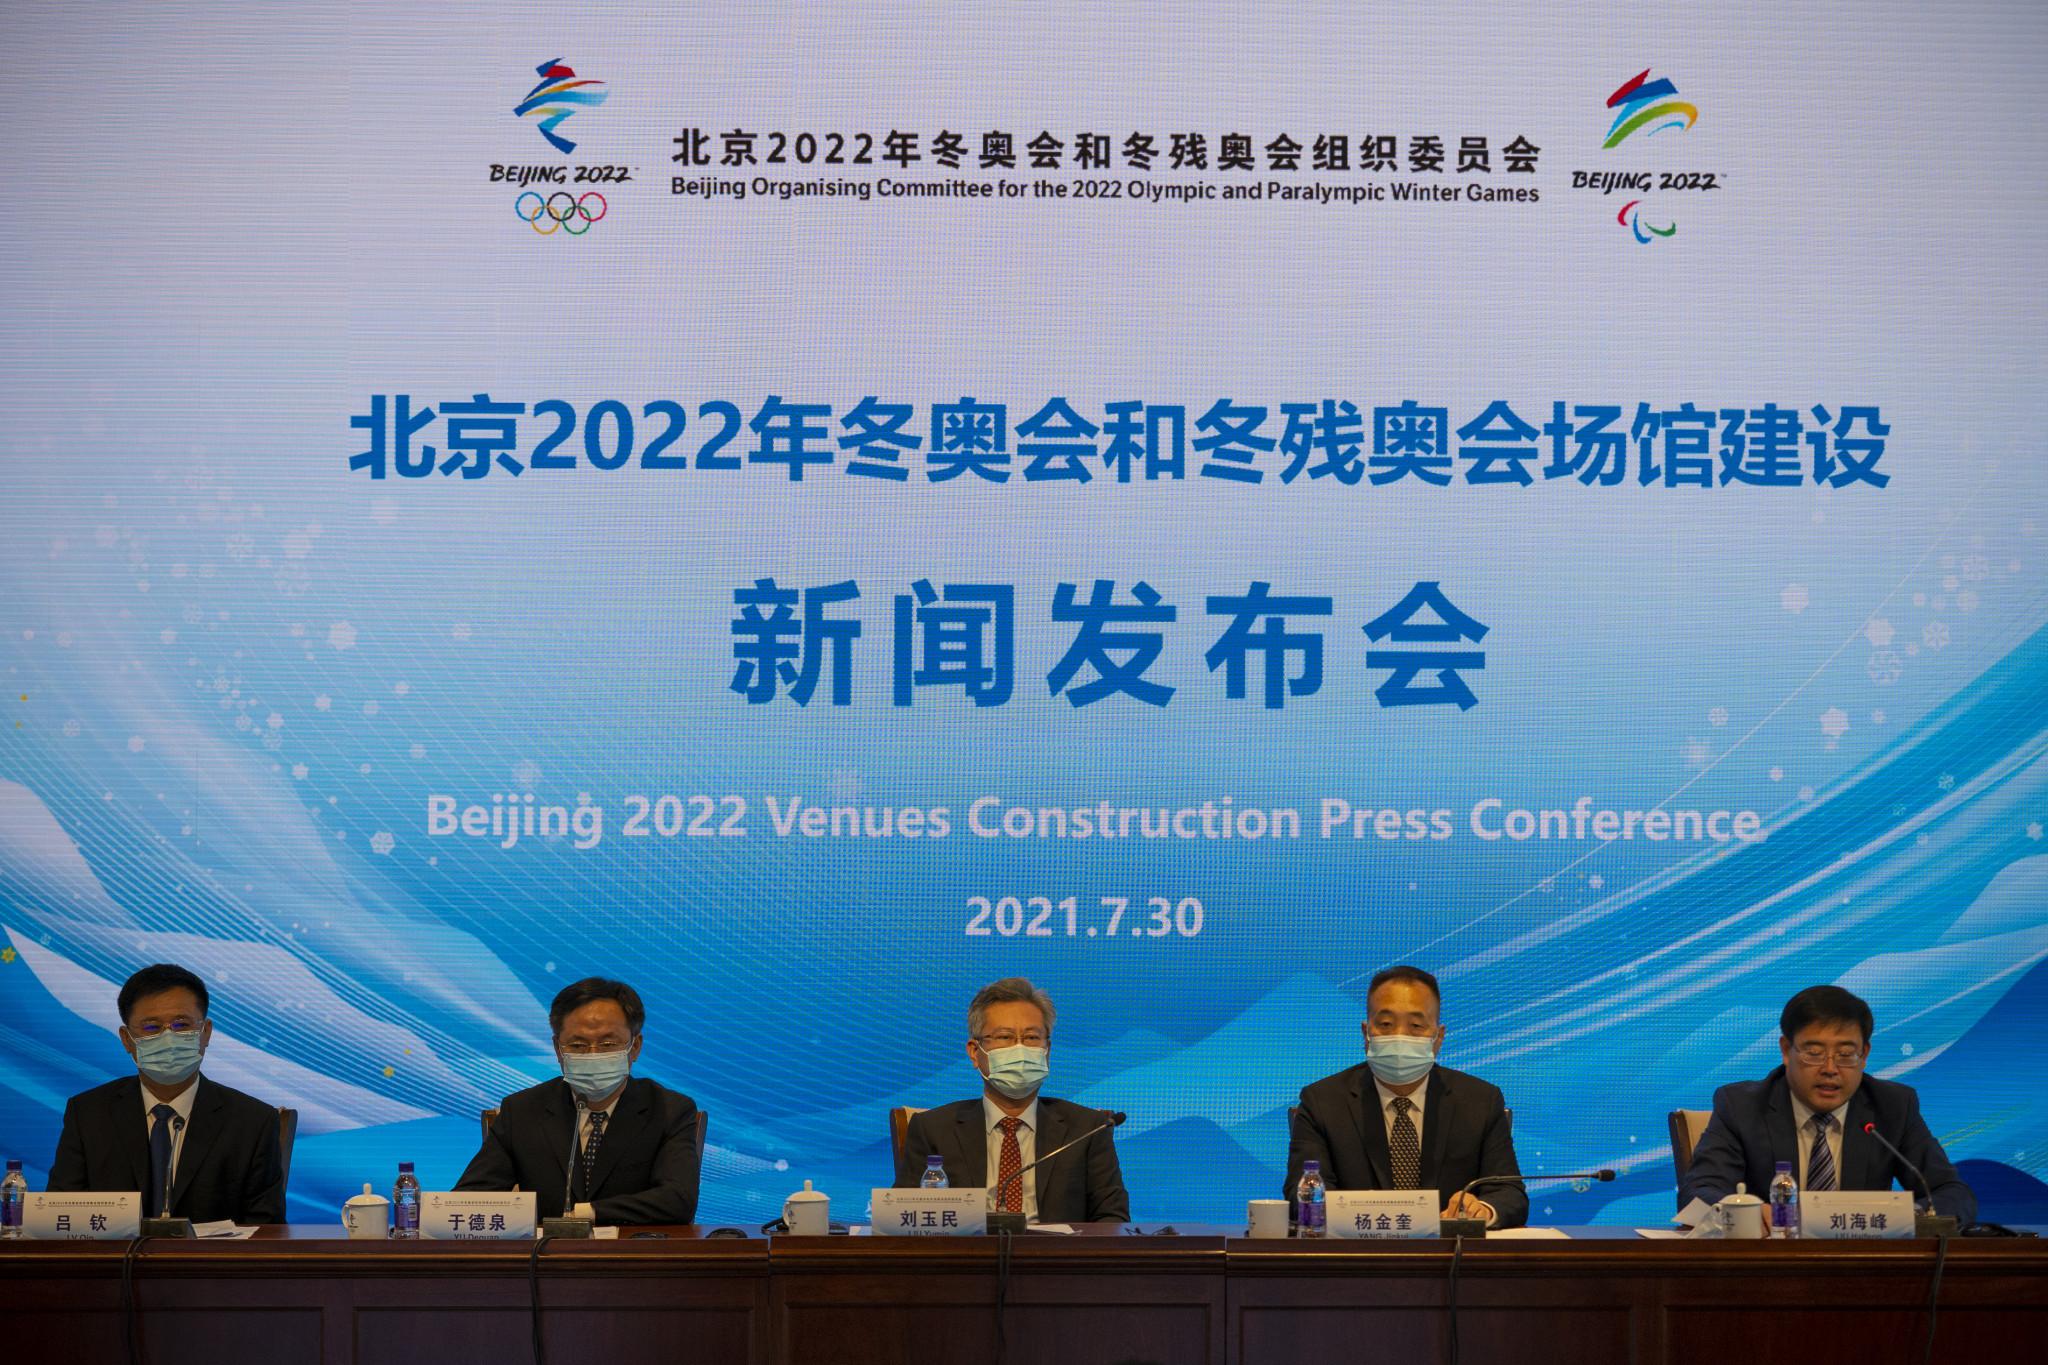 Beijing 2022 Opening Ceremony stadium to complete transformation in October